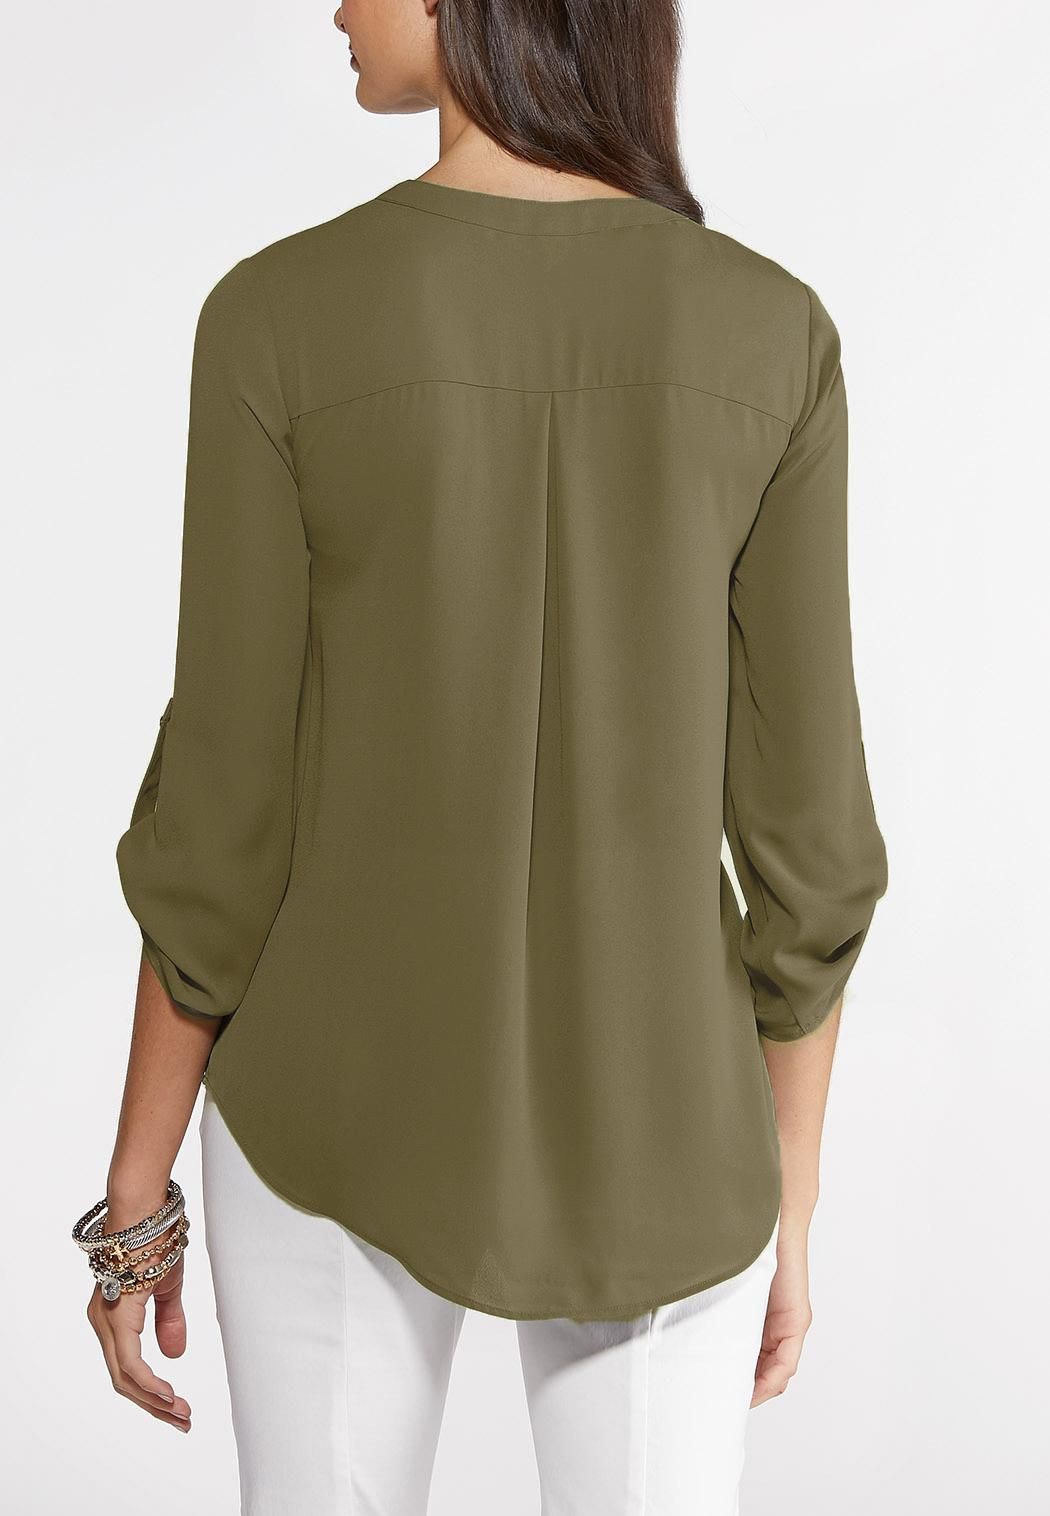 Plus Size Solid Equipment Shirt (Item #44102887)